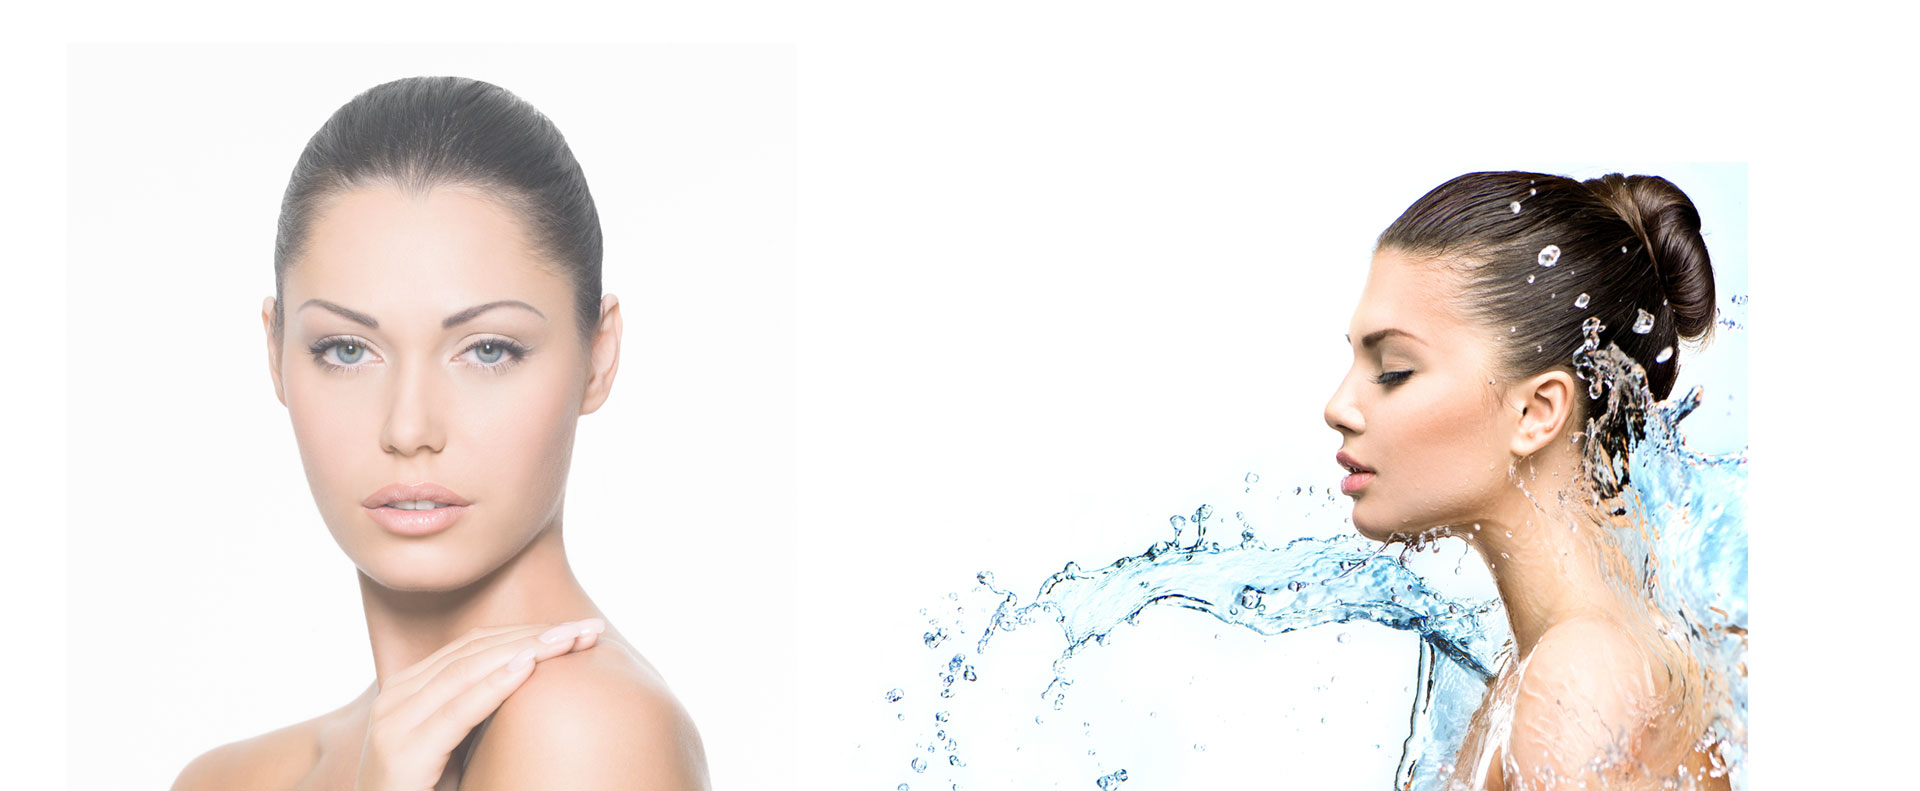 Cryo Facial Skincare – Revolution and Impression Beauty Clinic